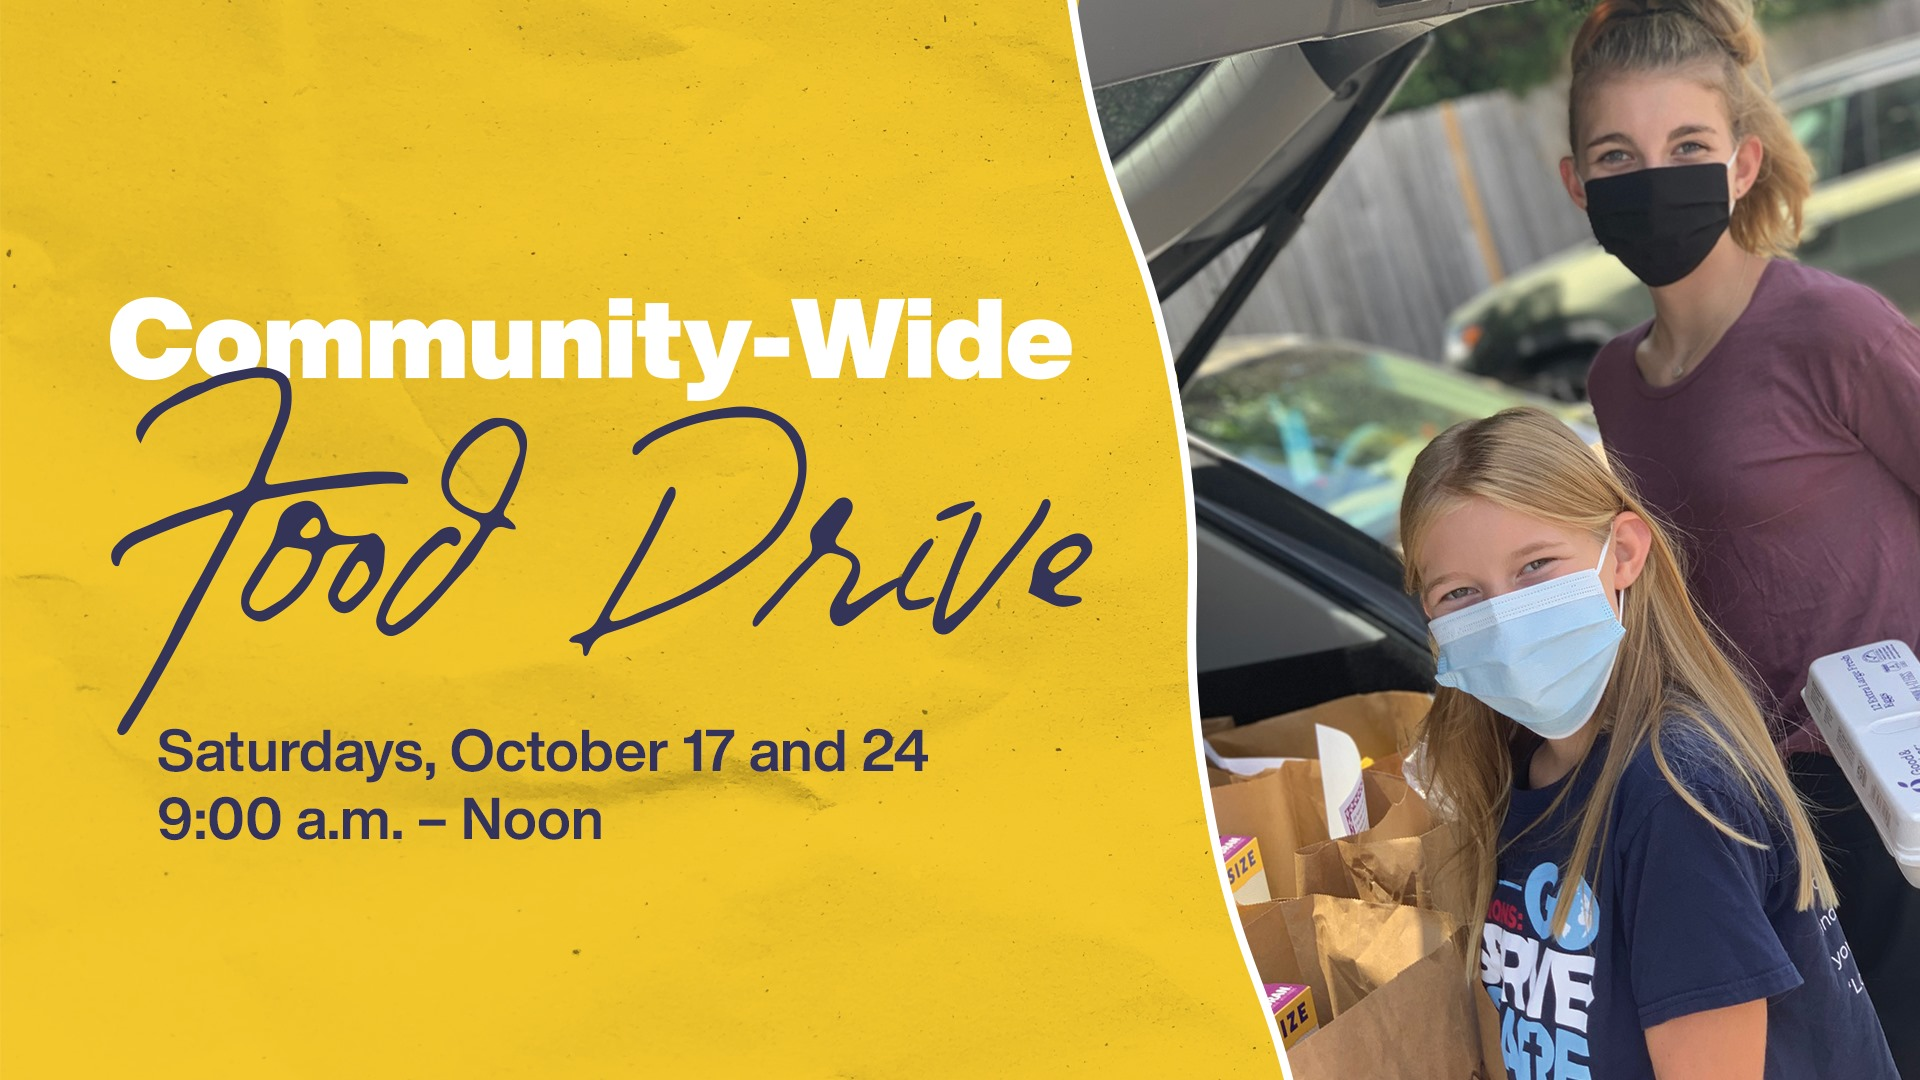 TWUMC Woodlands United Methodist Church community wide food drive 2020